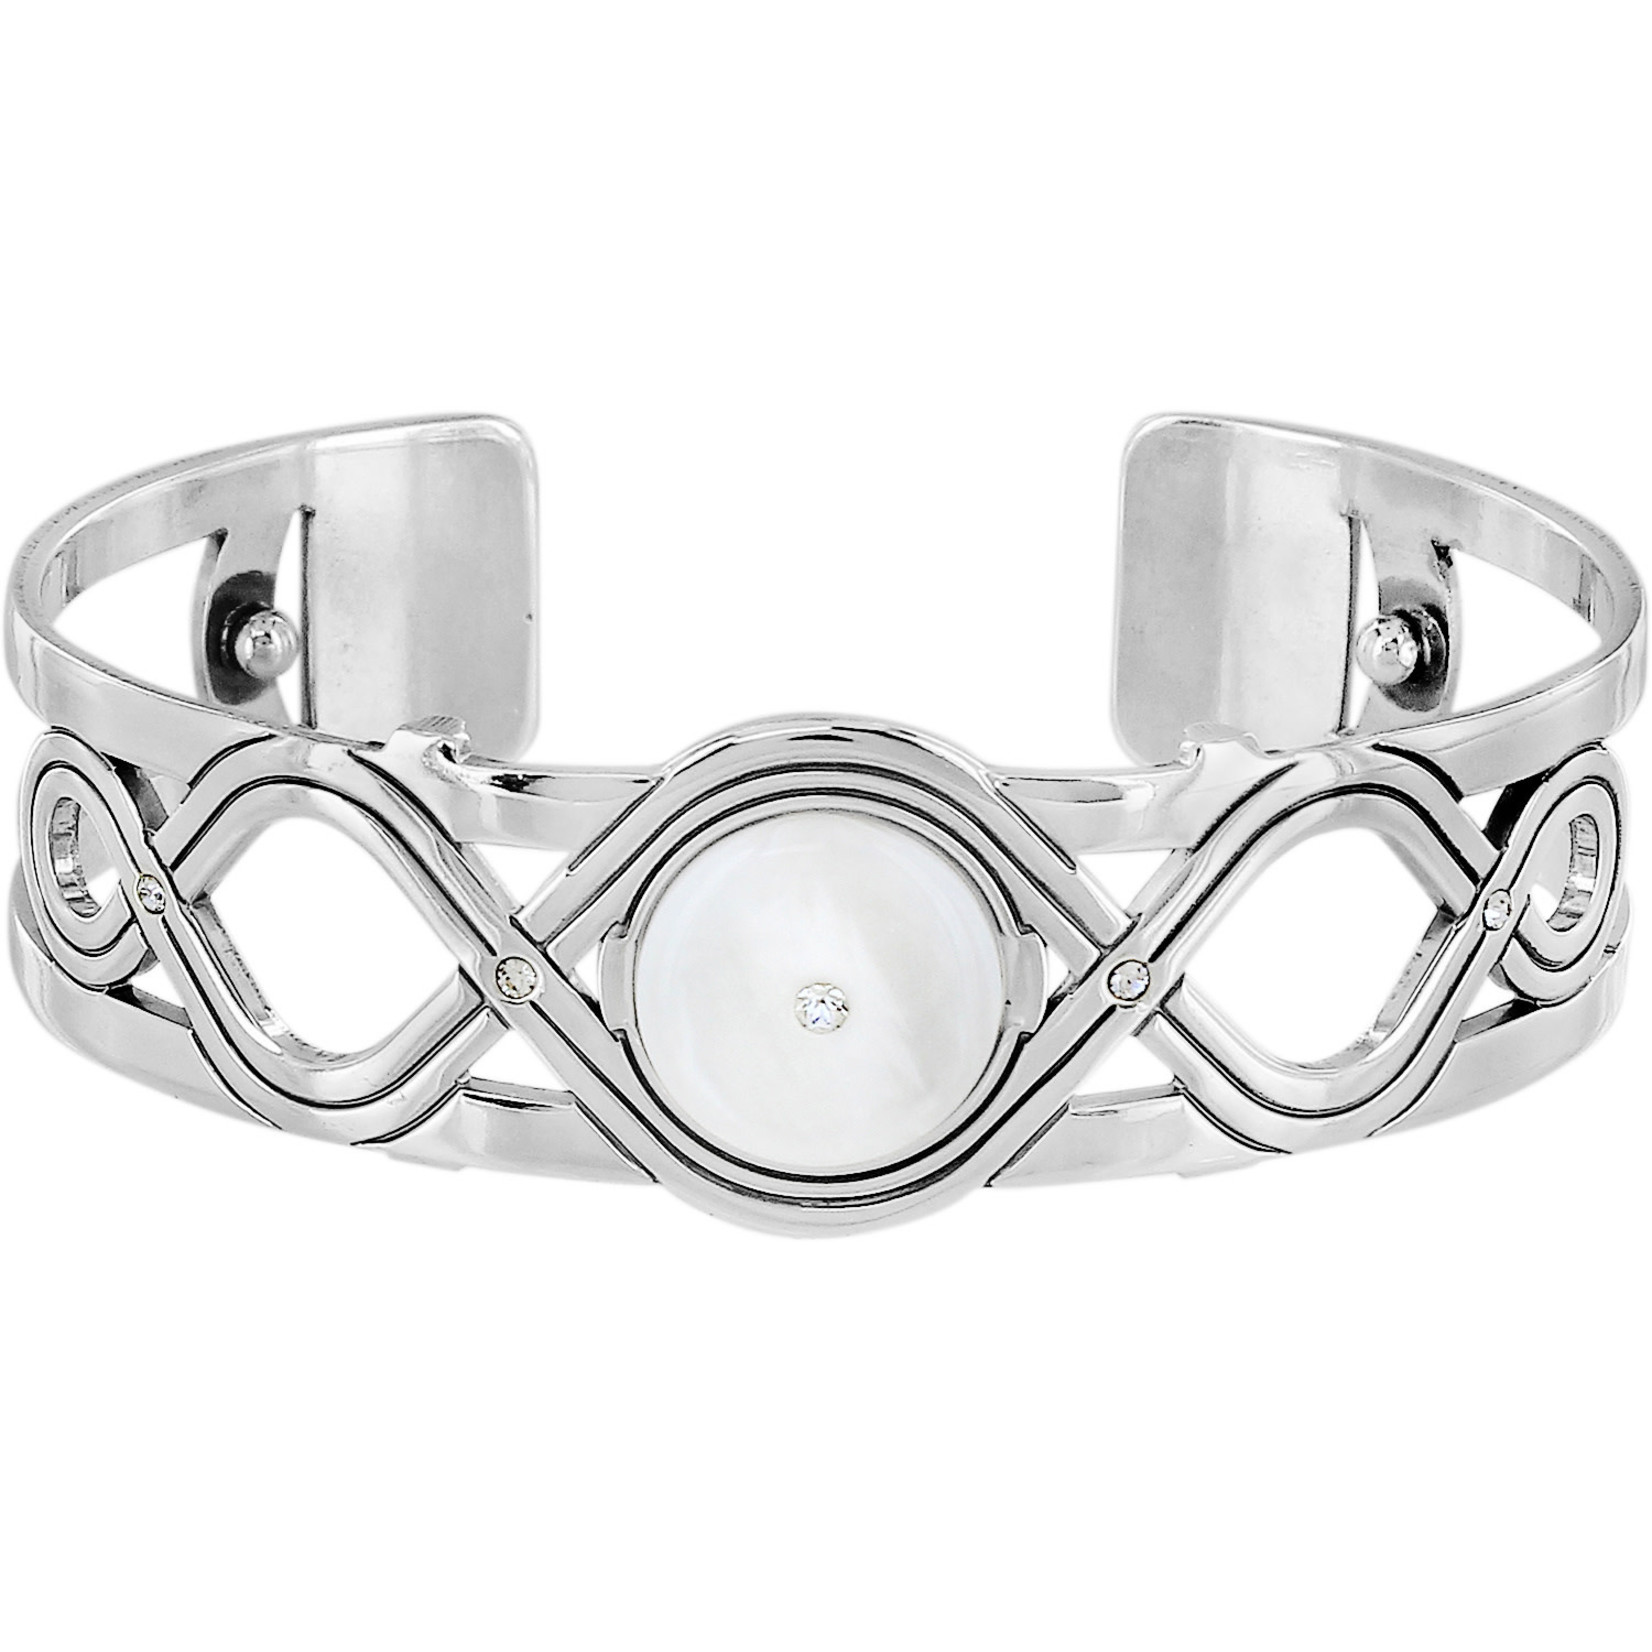 Brighton Christo Oahu Slim Cuff Bracelet